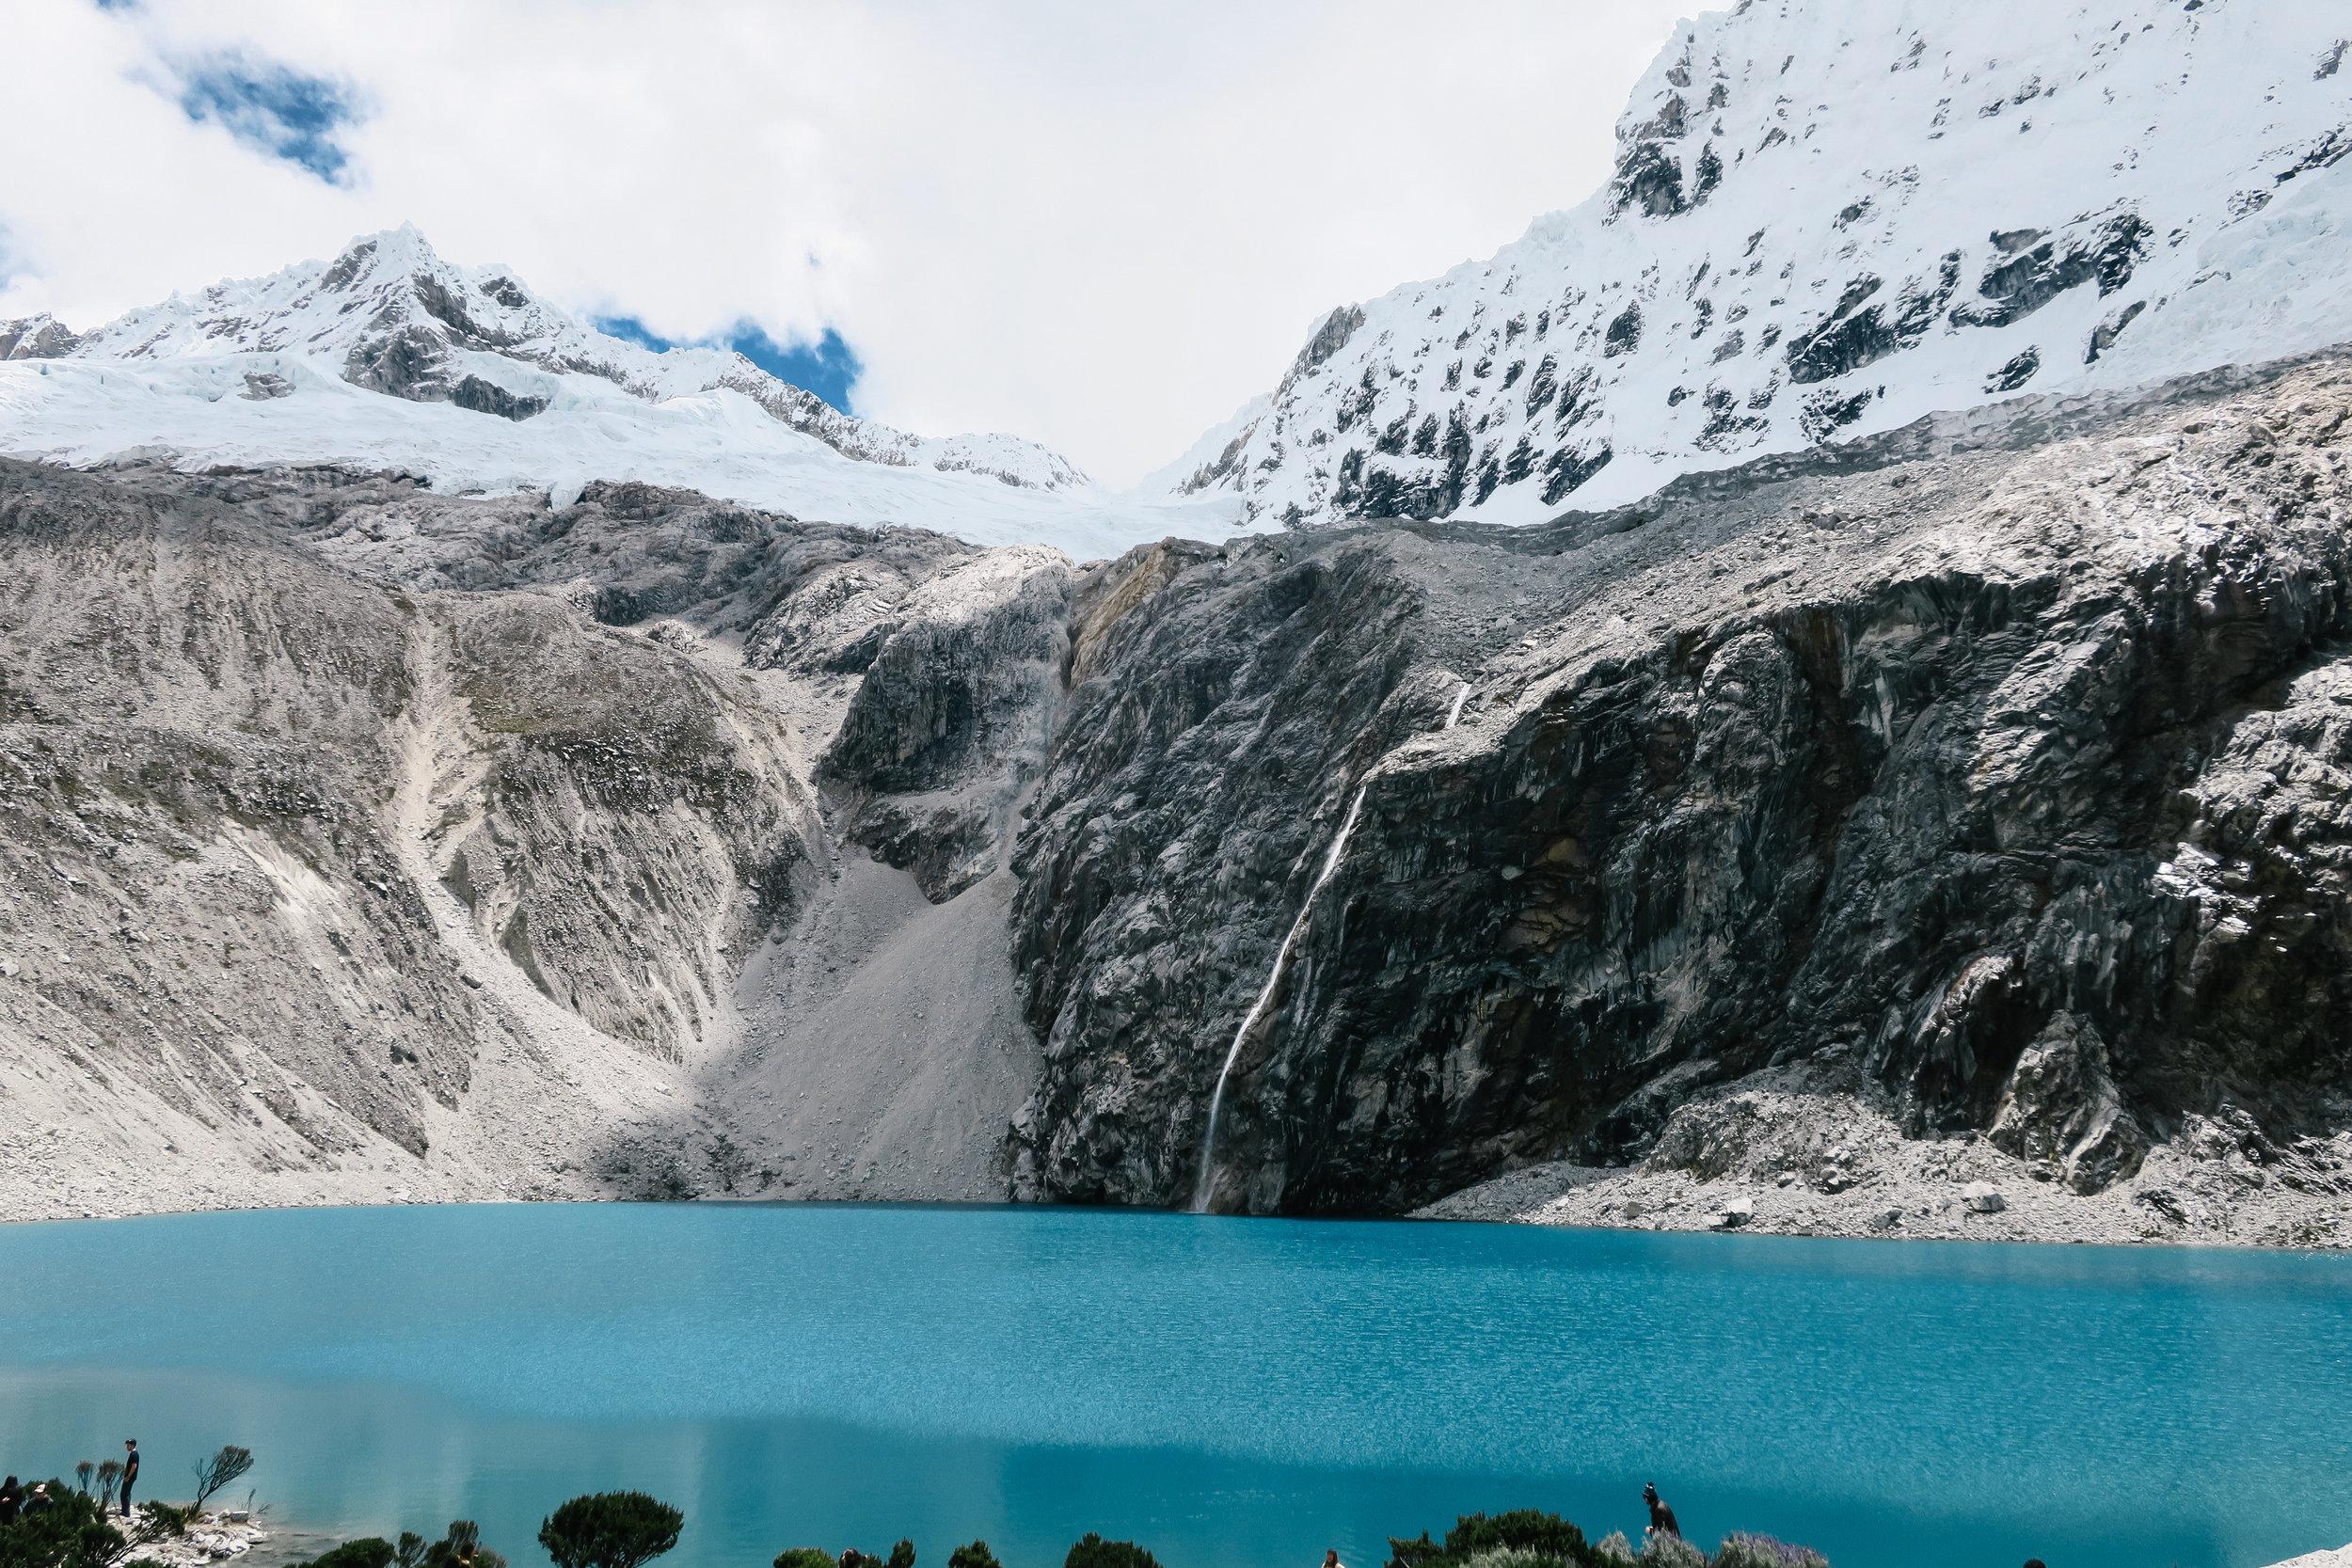 laguna+lake+69+hike+peru+travel+guide+life+on+pine_IMG_2287.jpg